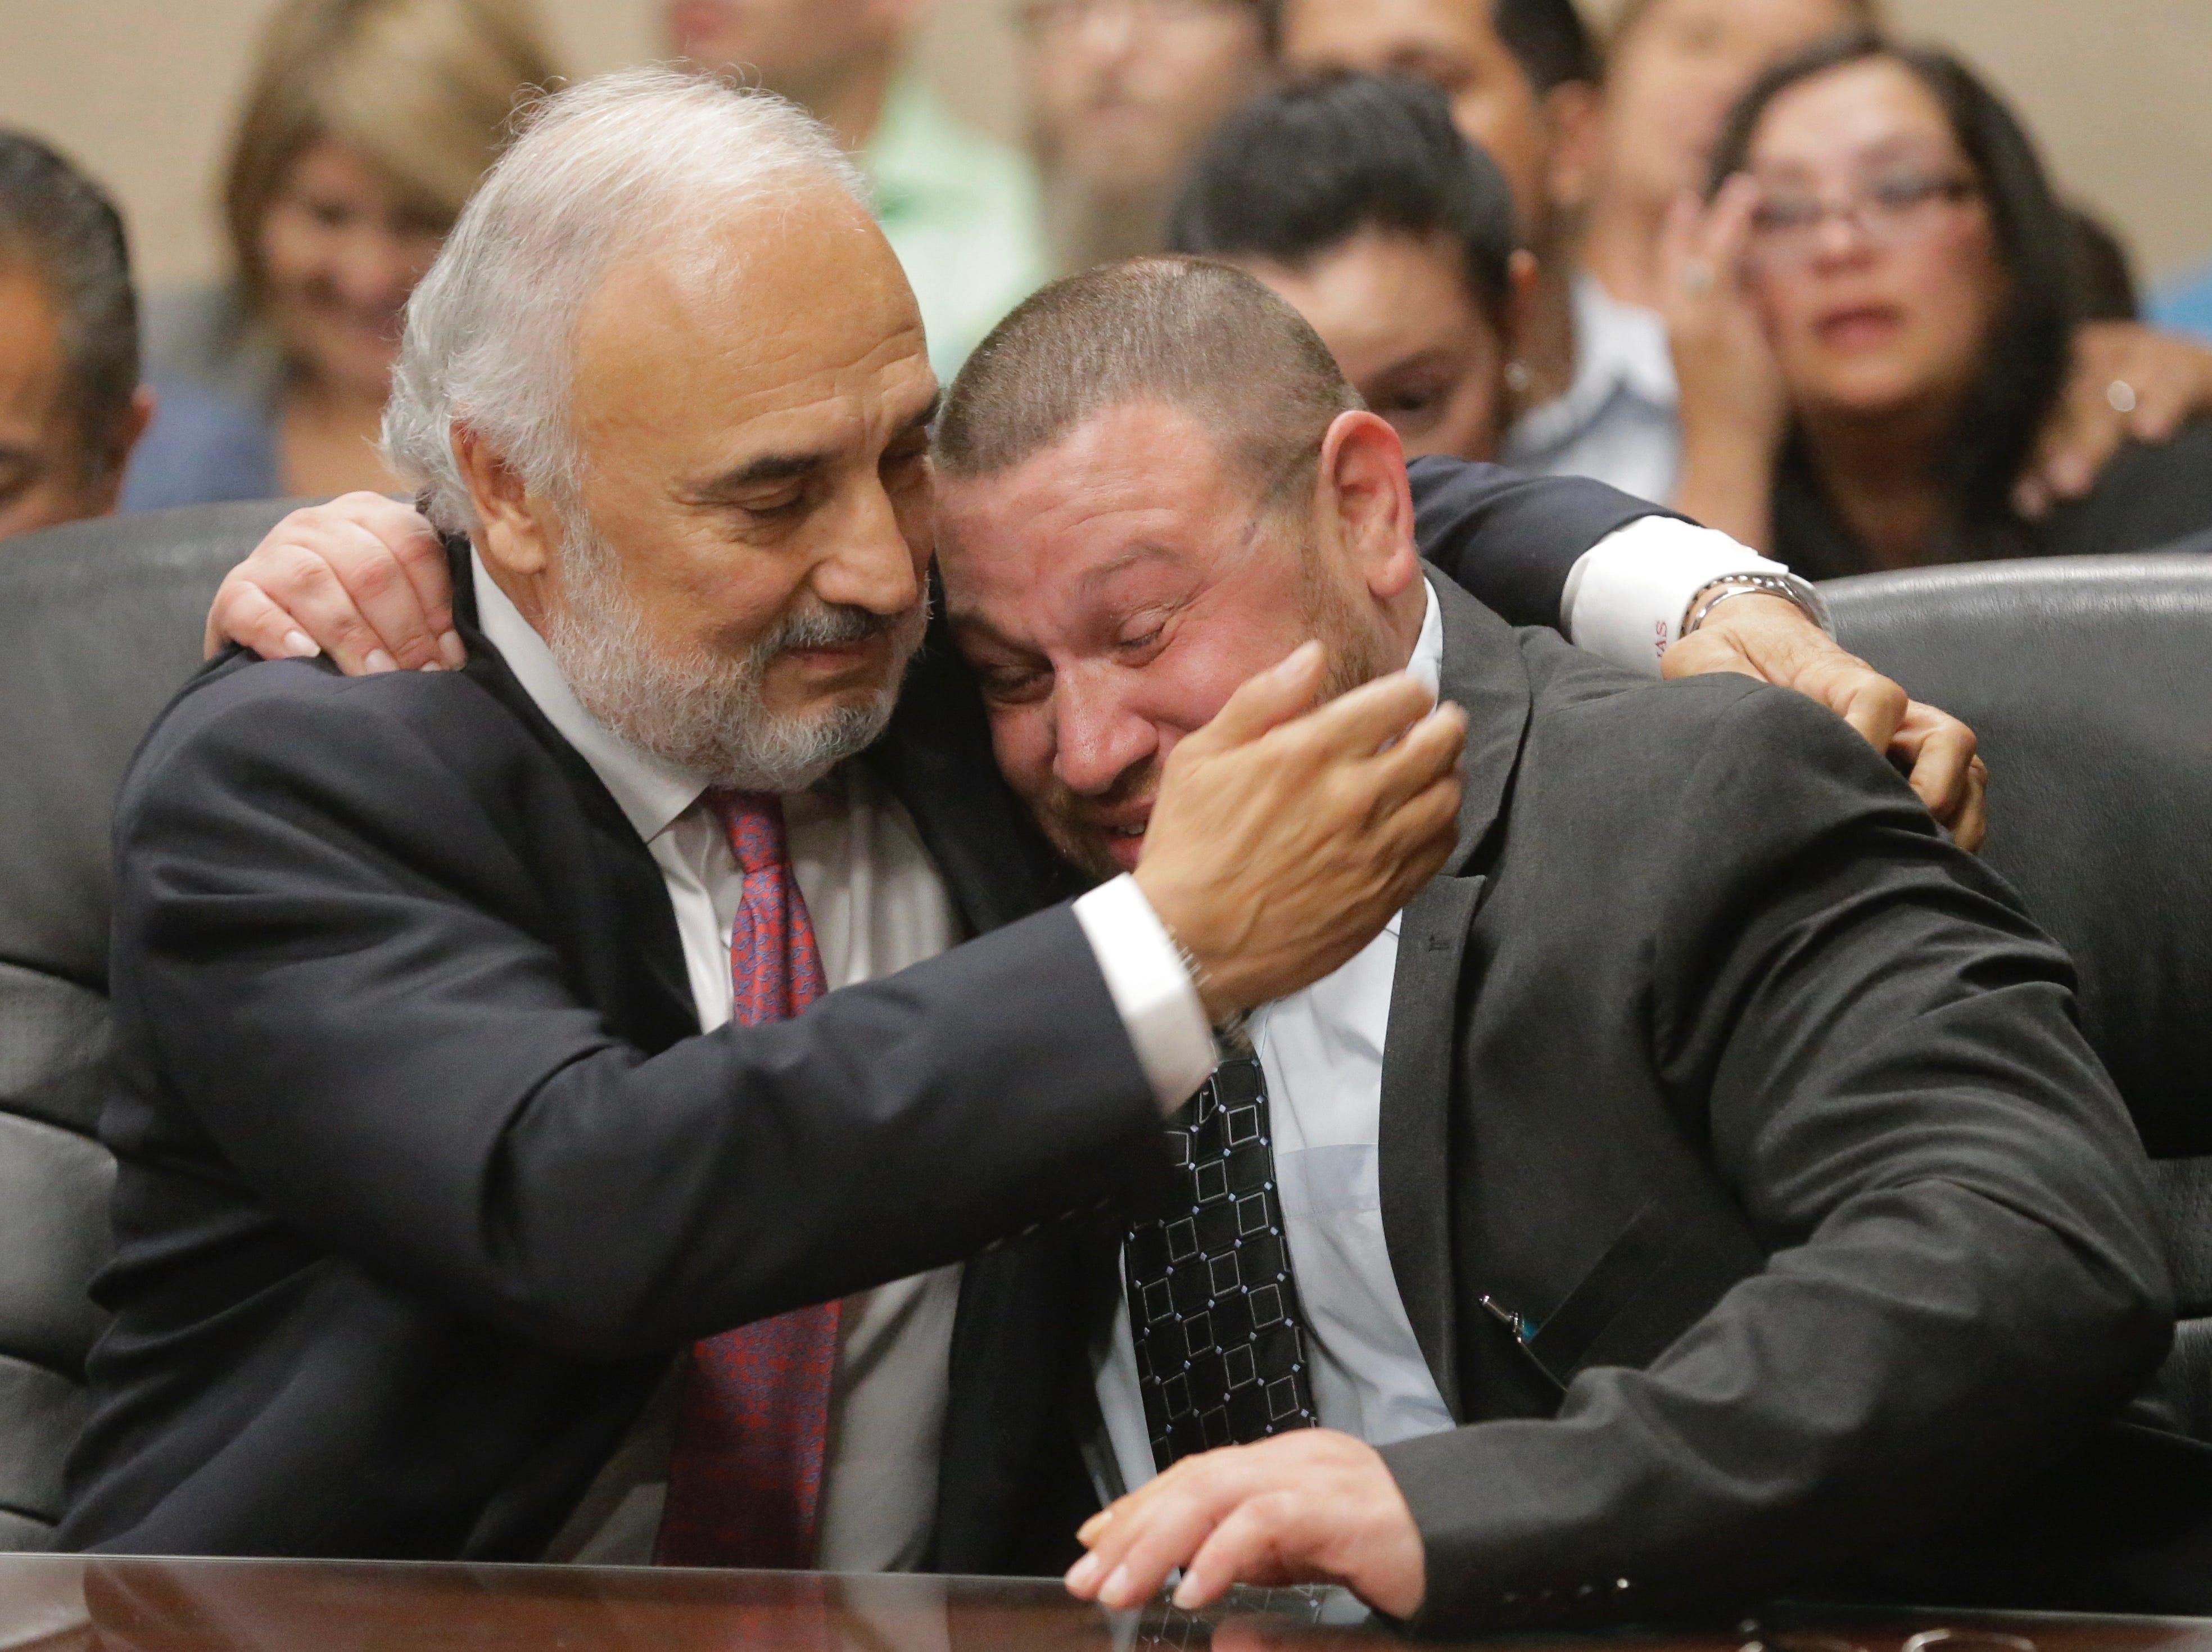 Defense attorney Joe Spencer hugs Daniel Villegas after the verdict was read.